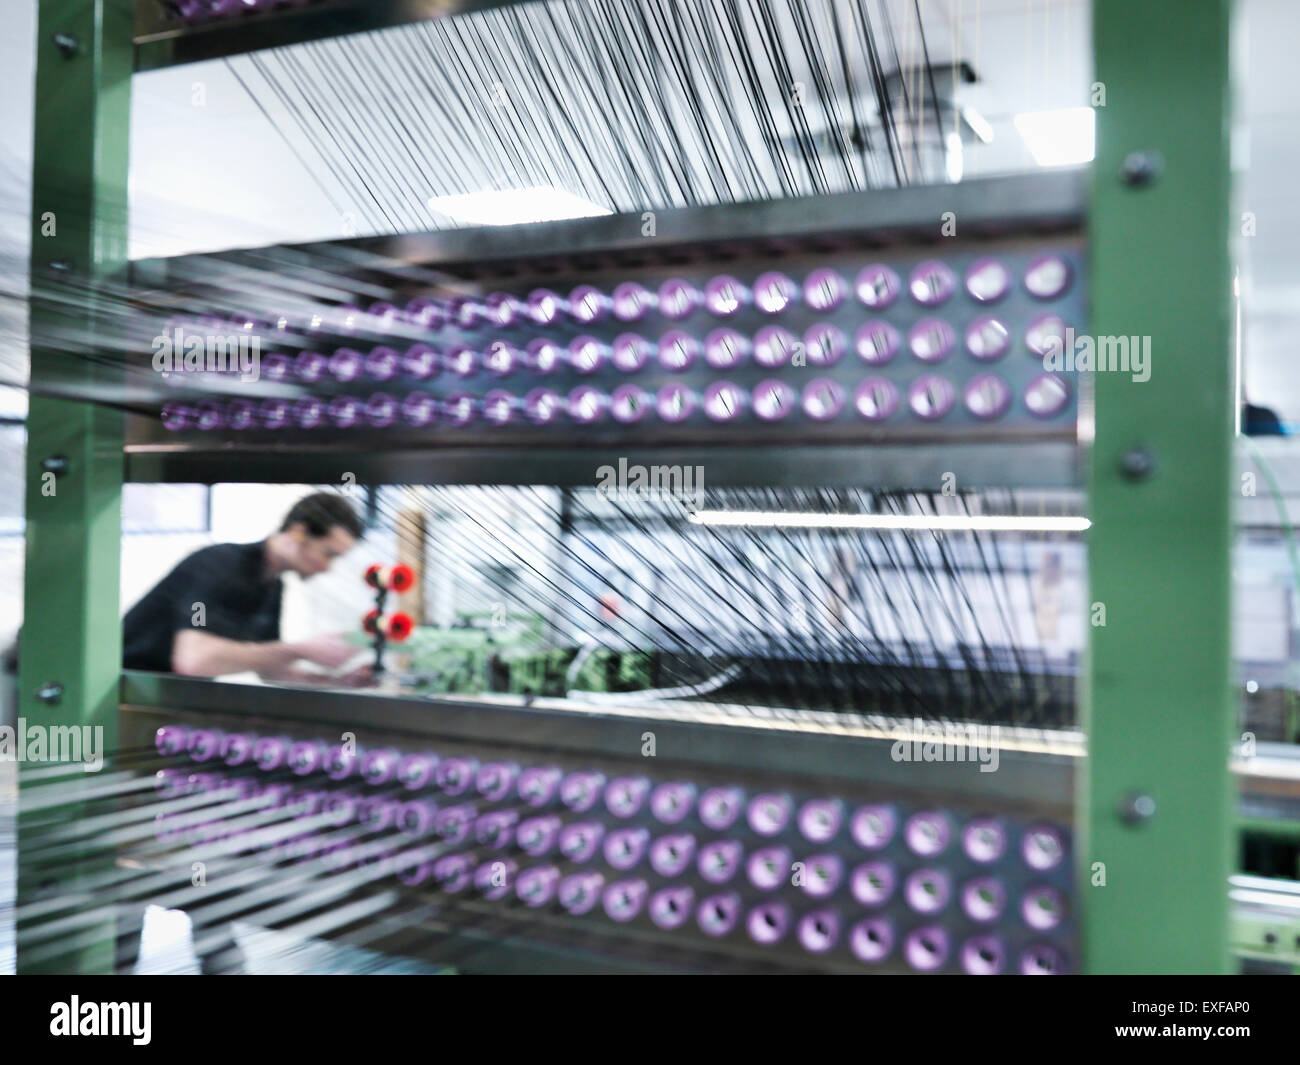 Worker weaving carbon fibre in carbon fibre factory - Stock Image